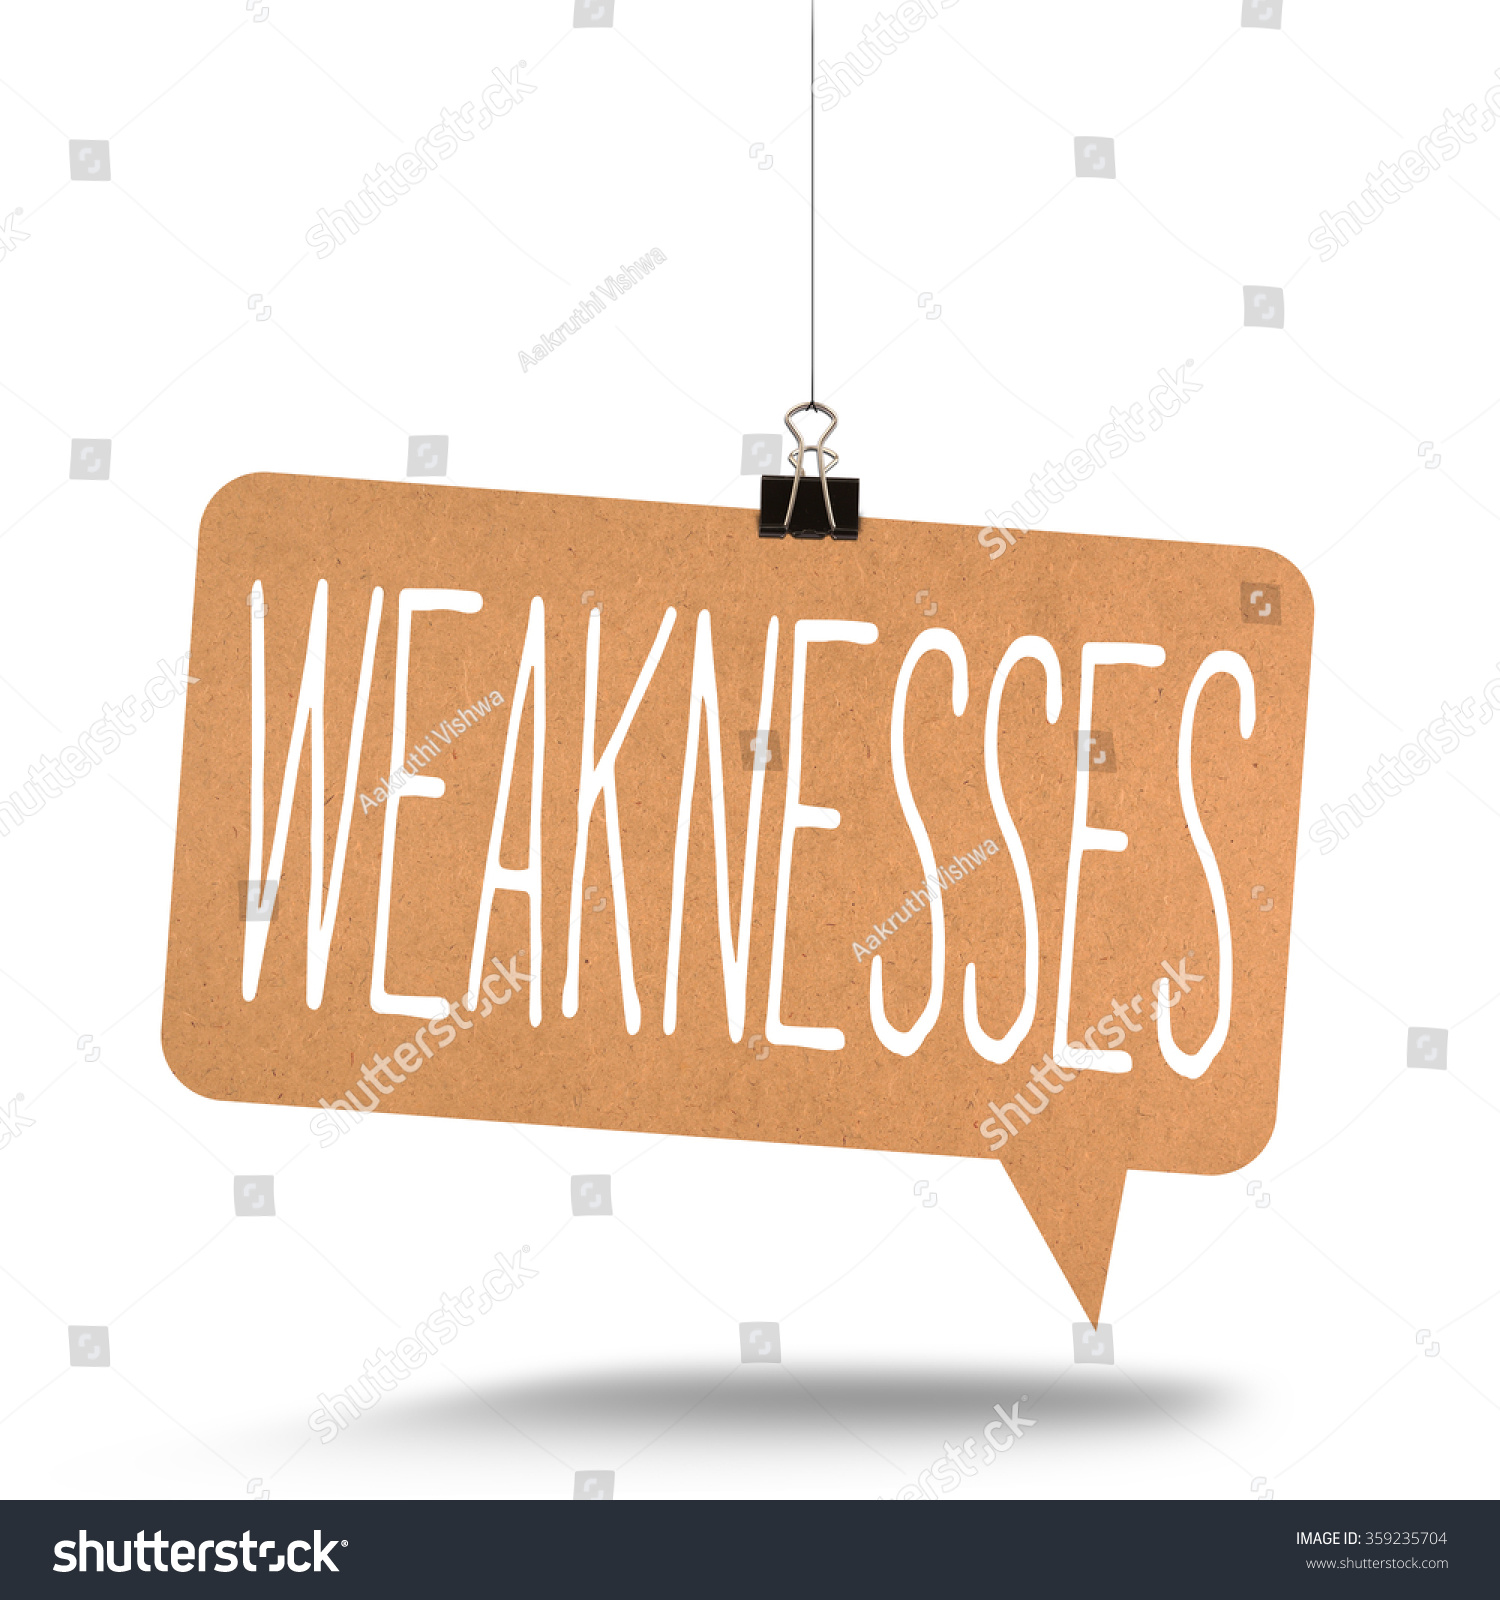 weaknesses word on cardboard stock photo shutterstock weaknesses word on cardboard